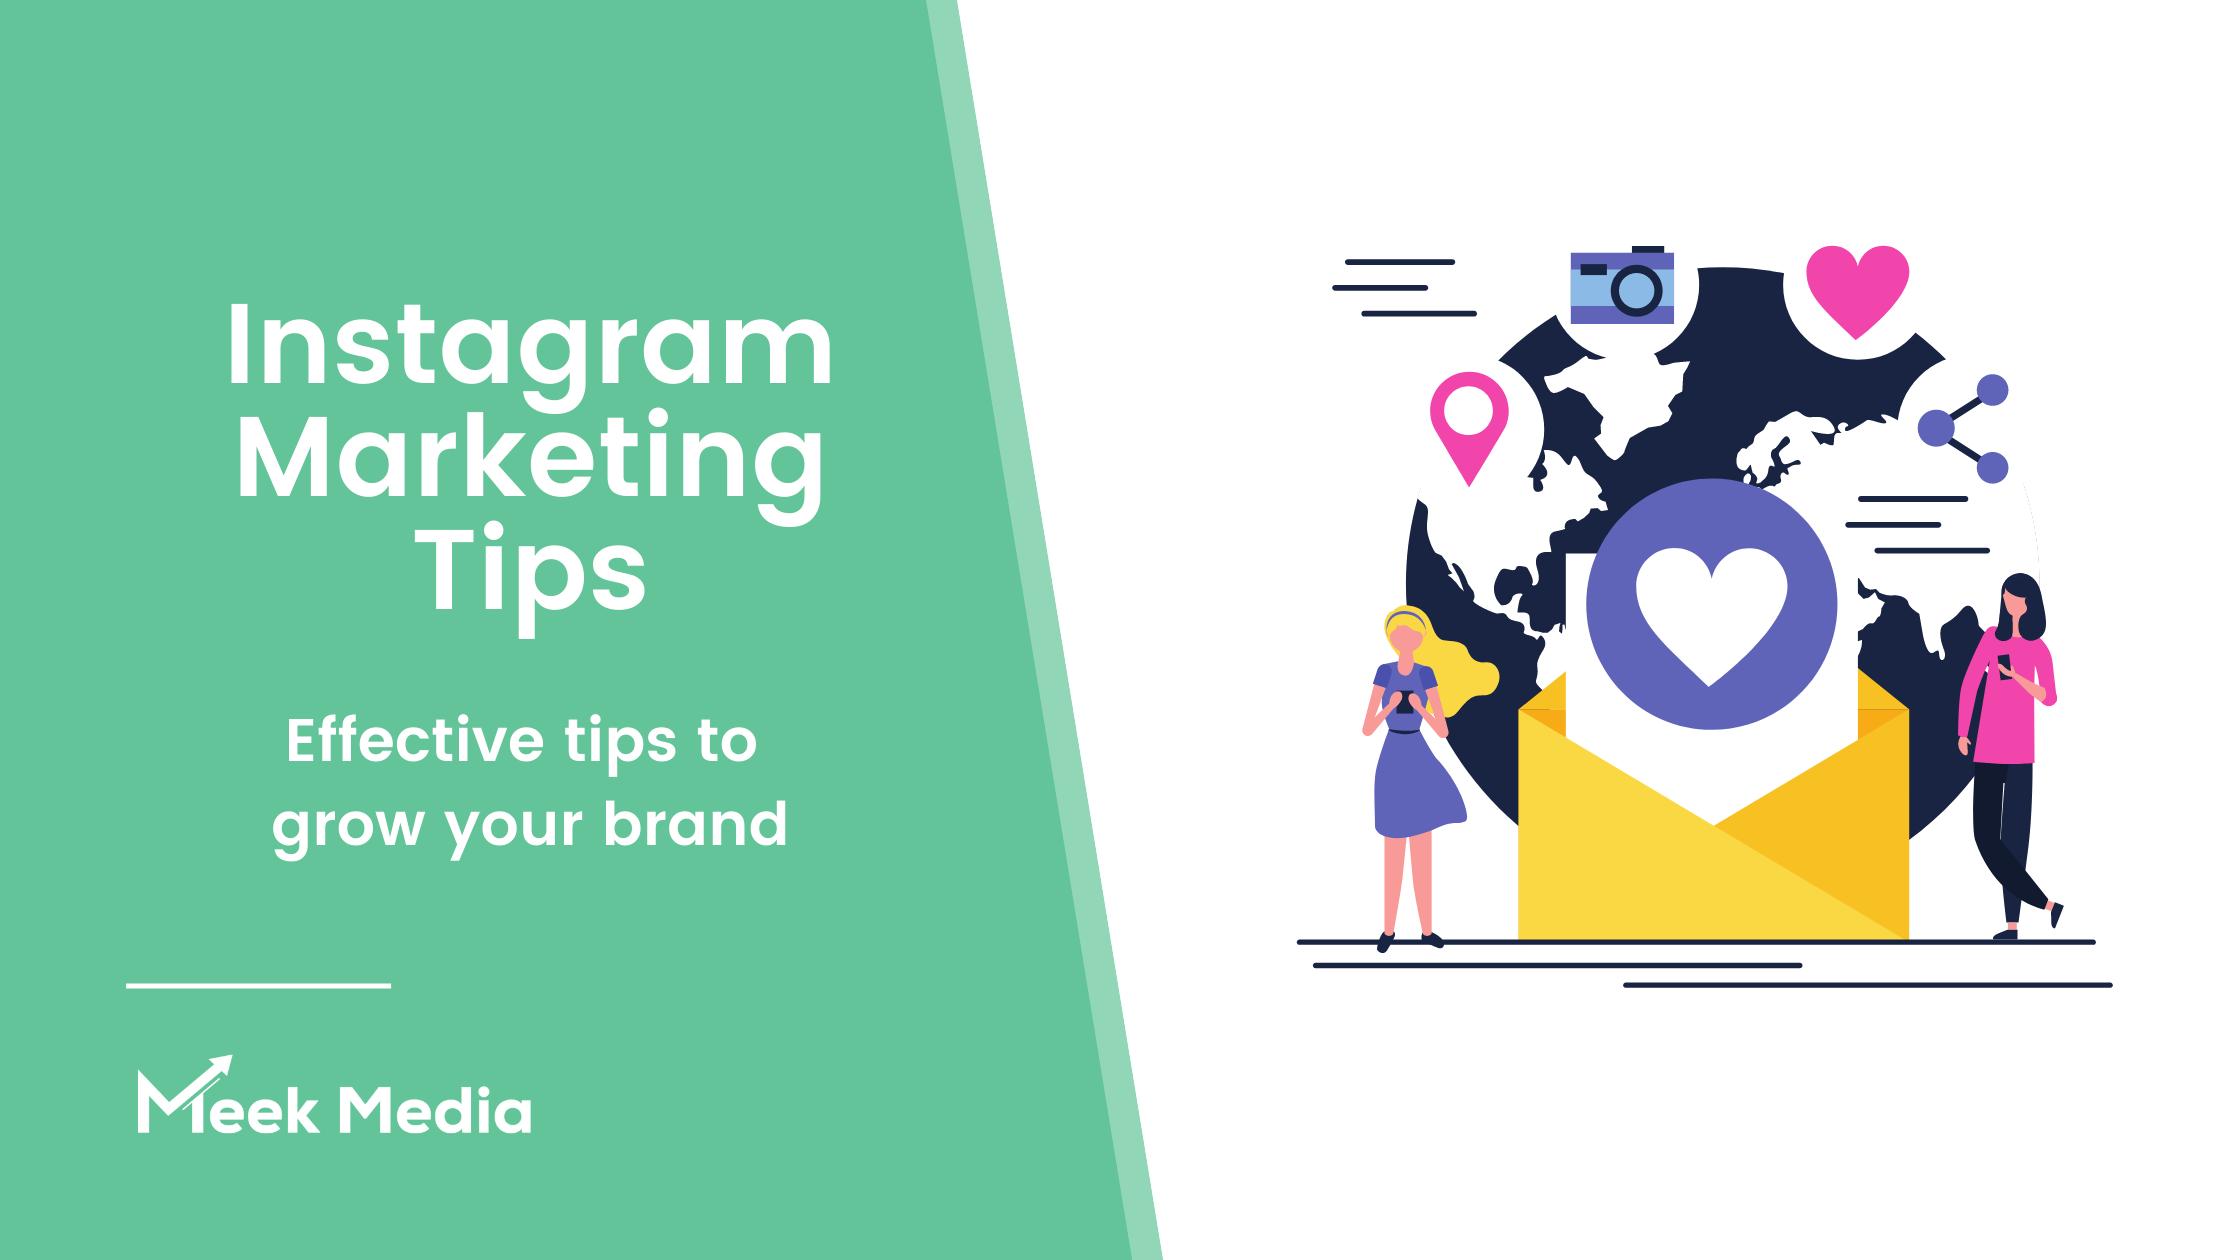 Best Instagram Marketing Tips 2021